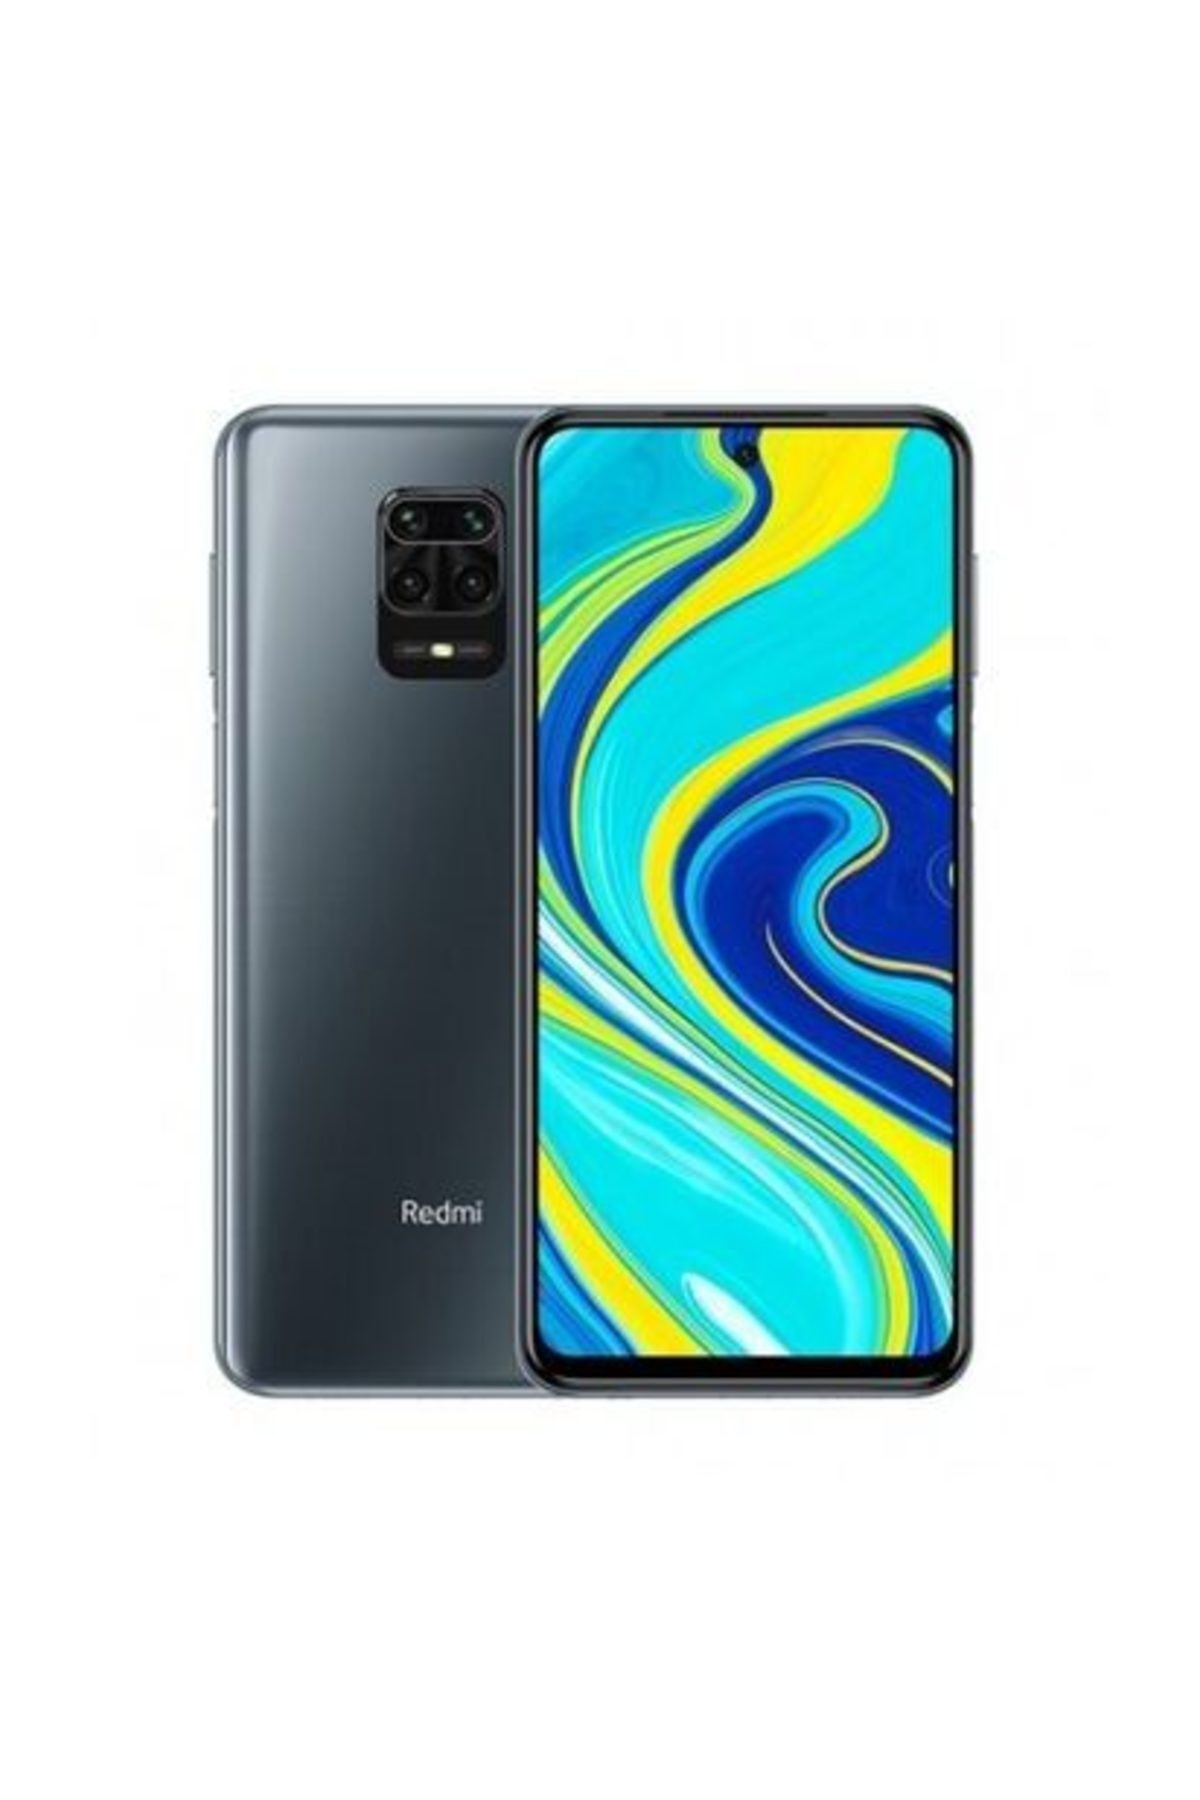 Xiaomi Redmi Note 9S 64GB Interstellar Gri Cep Telefonu (Xiaomi Türkiye Garantili) 1